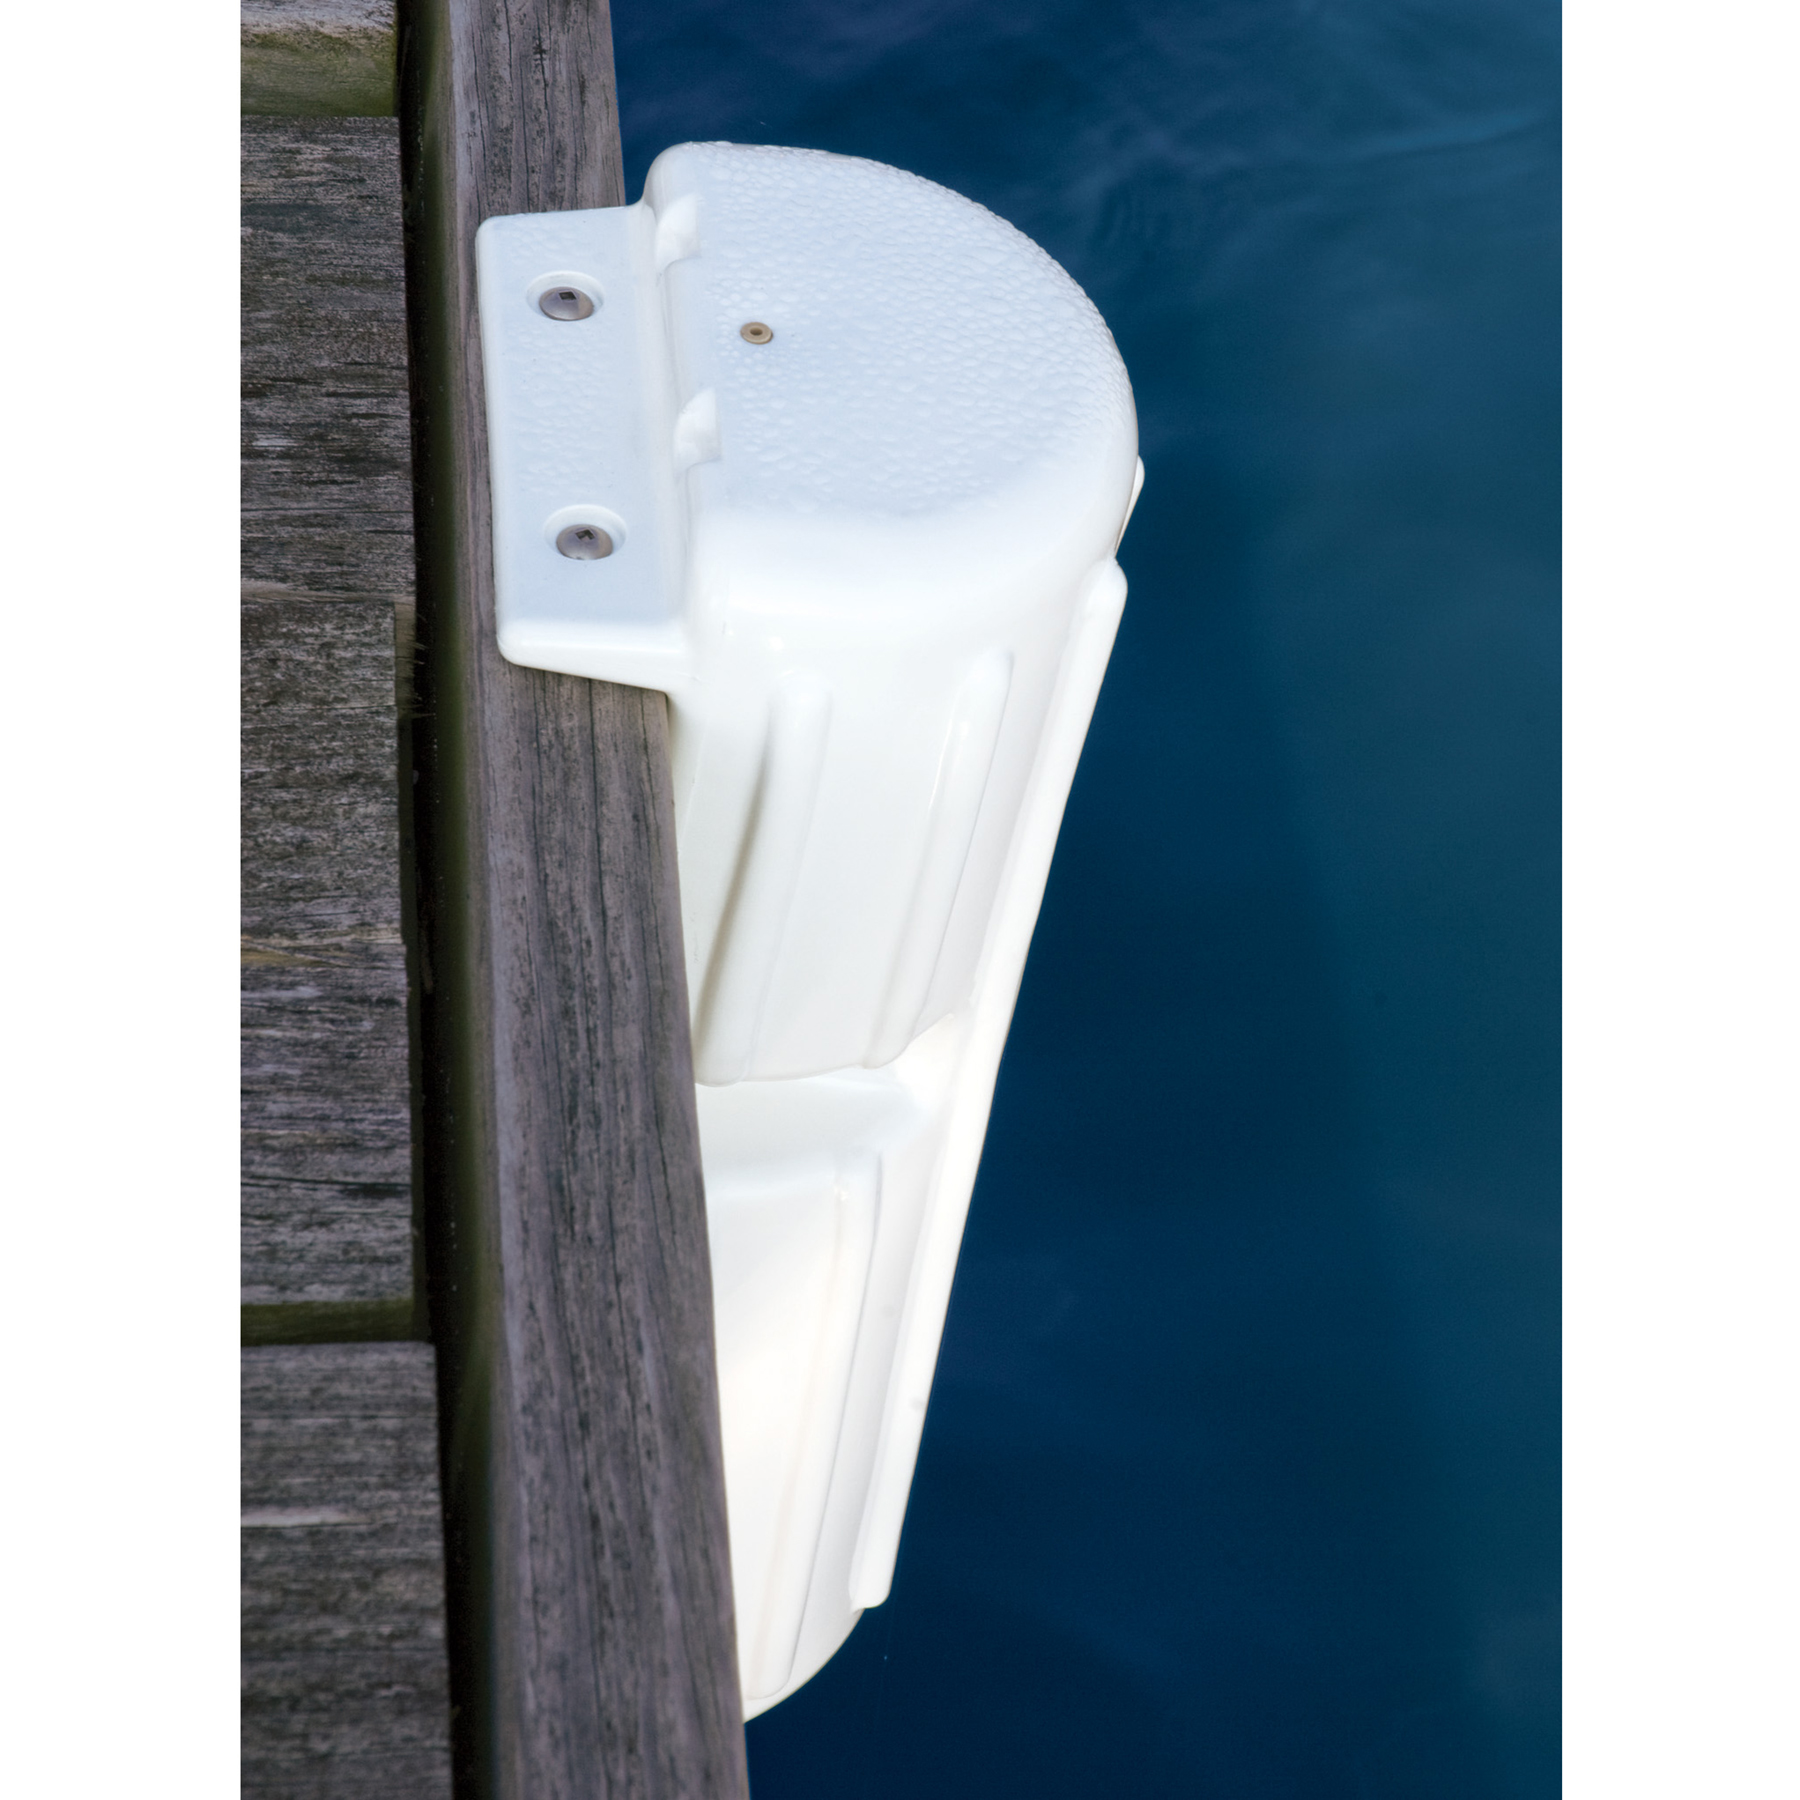 Dockmate Ultimate Dock Fender Package